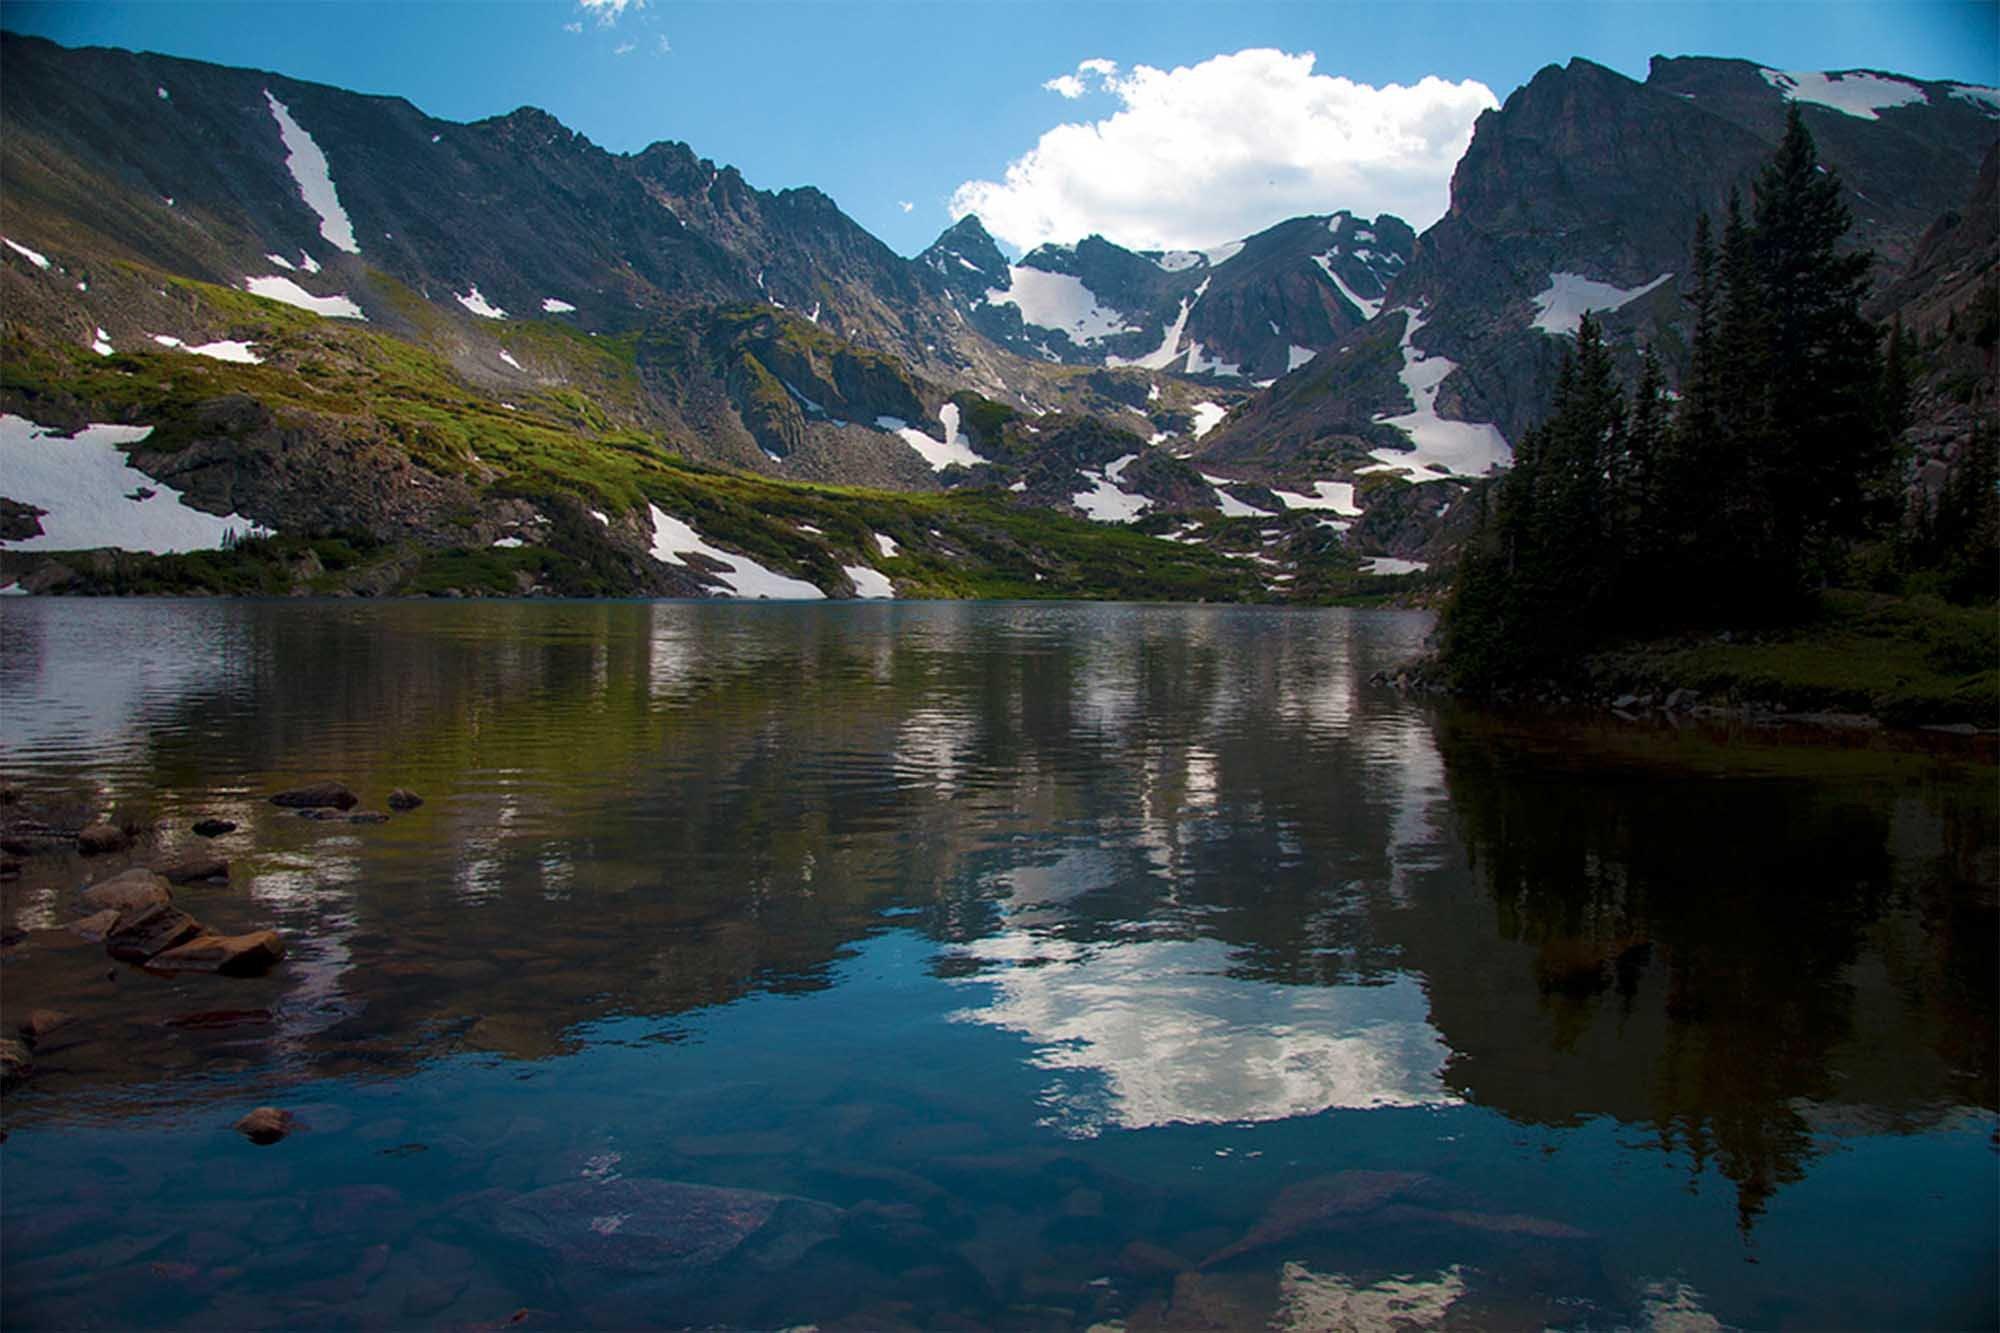 rentals cabins for estes colorado park united mountain rooms in cabin cozy rocky rent states